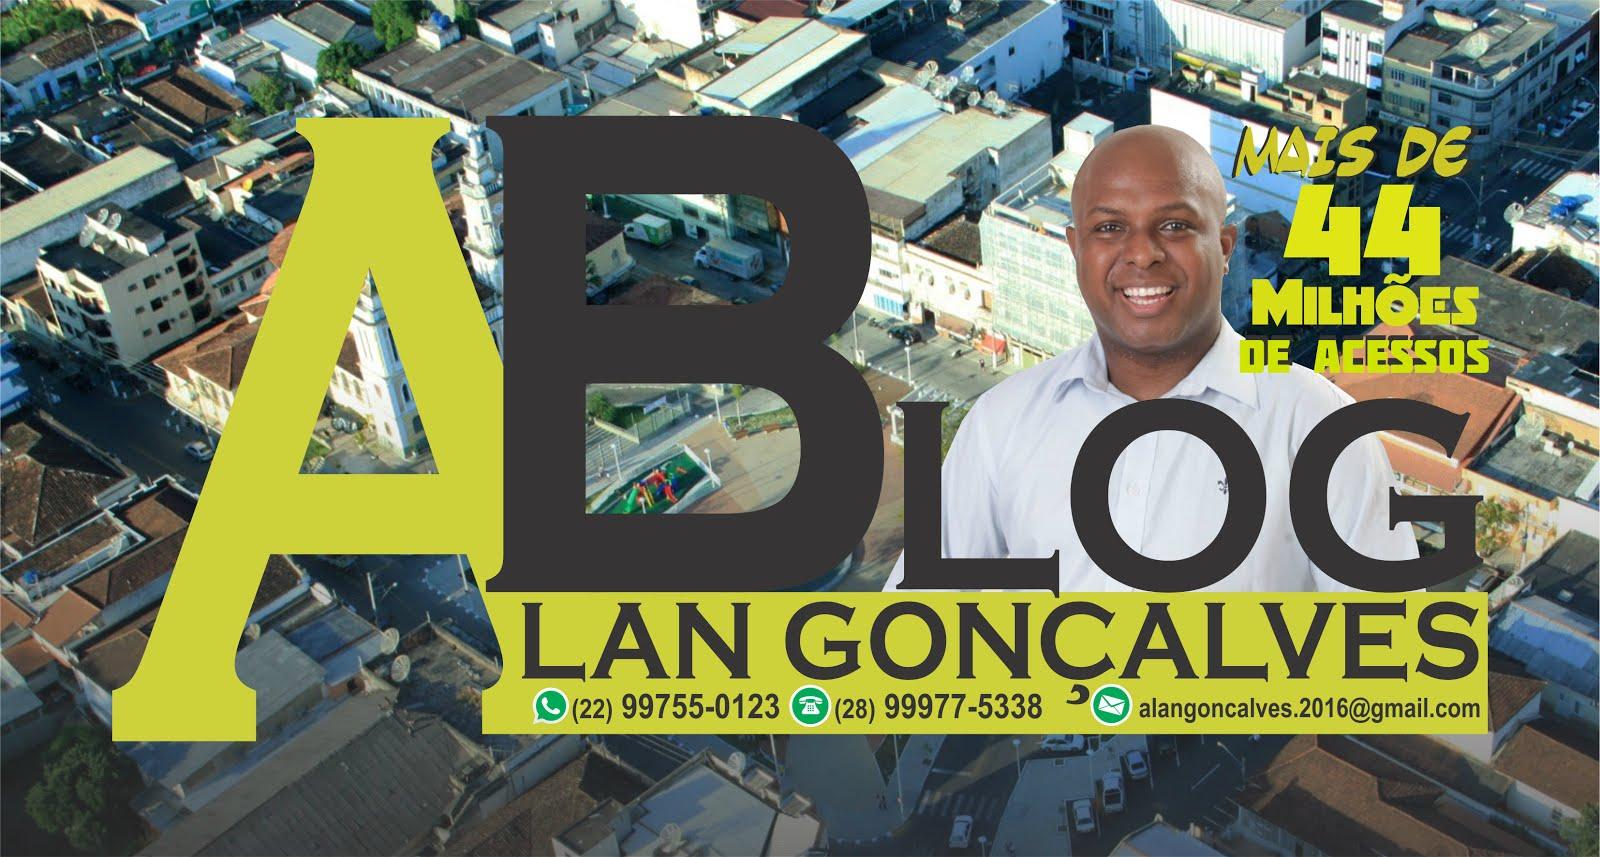 Blog Alan Gonçalves